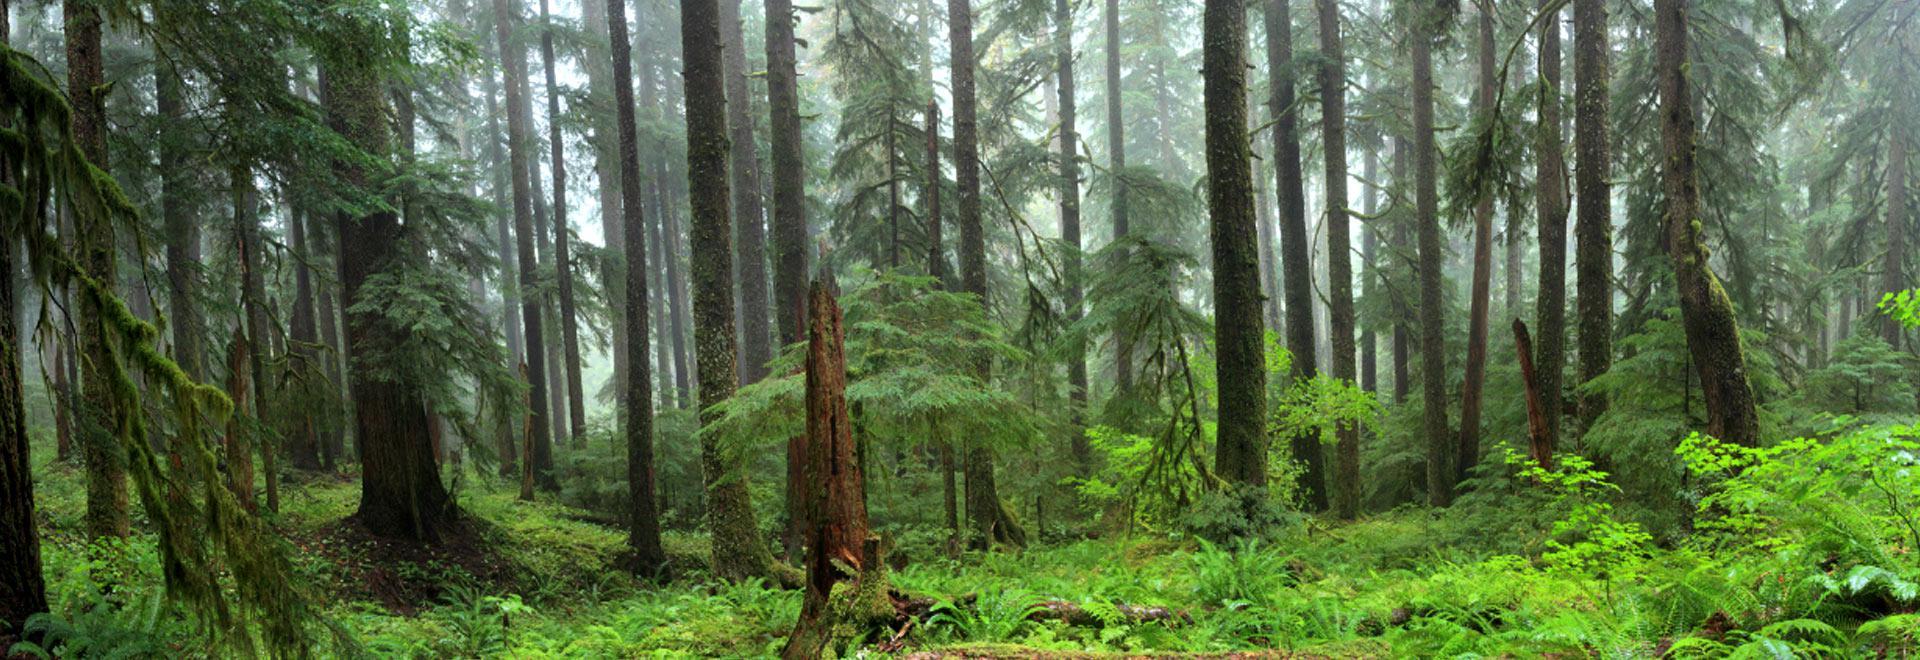 Przyroda widok lasu - element slidera